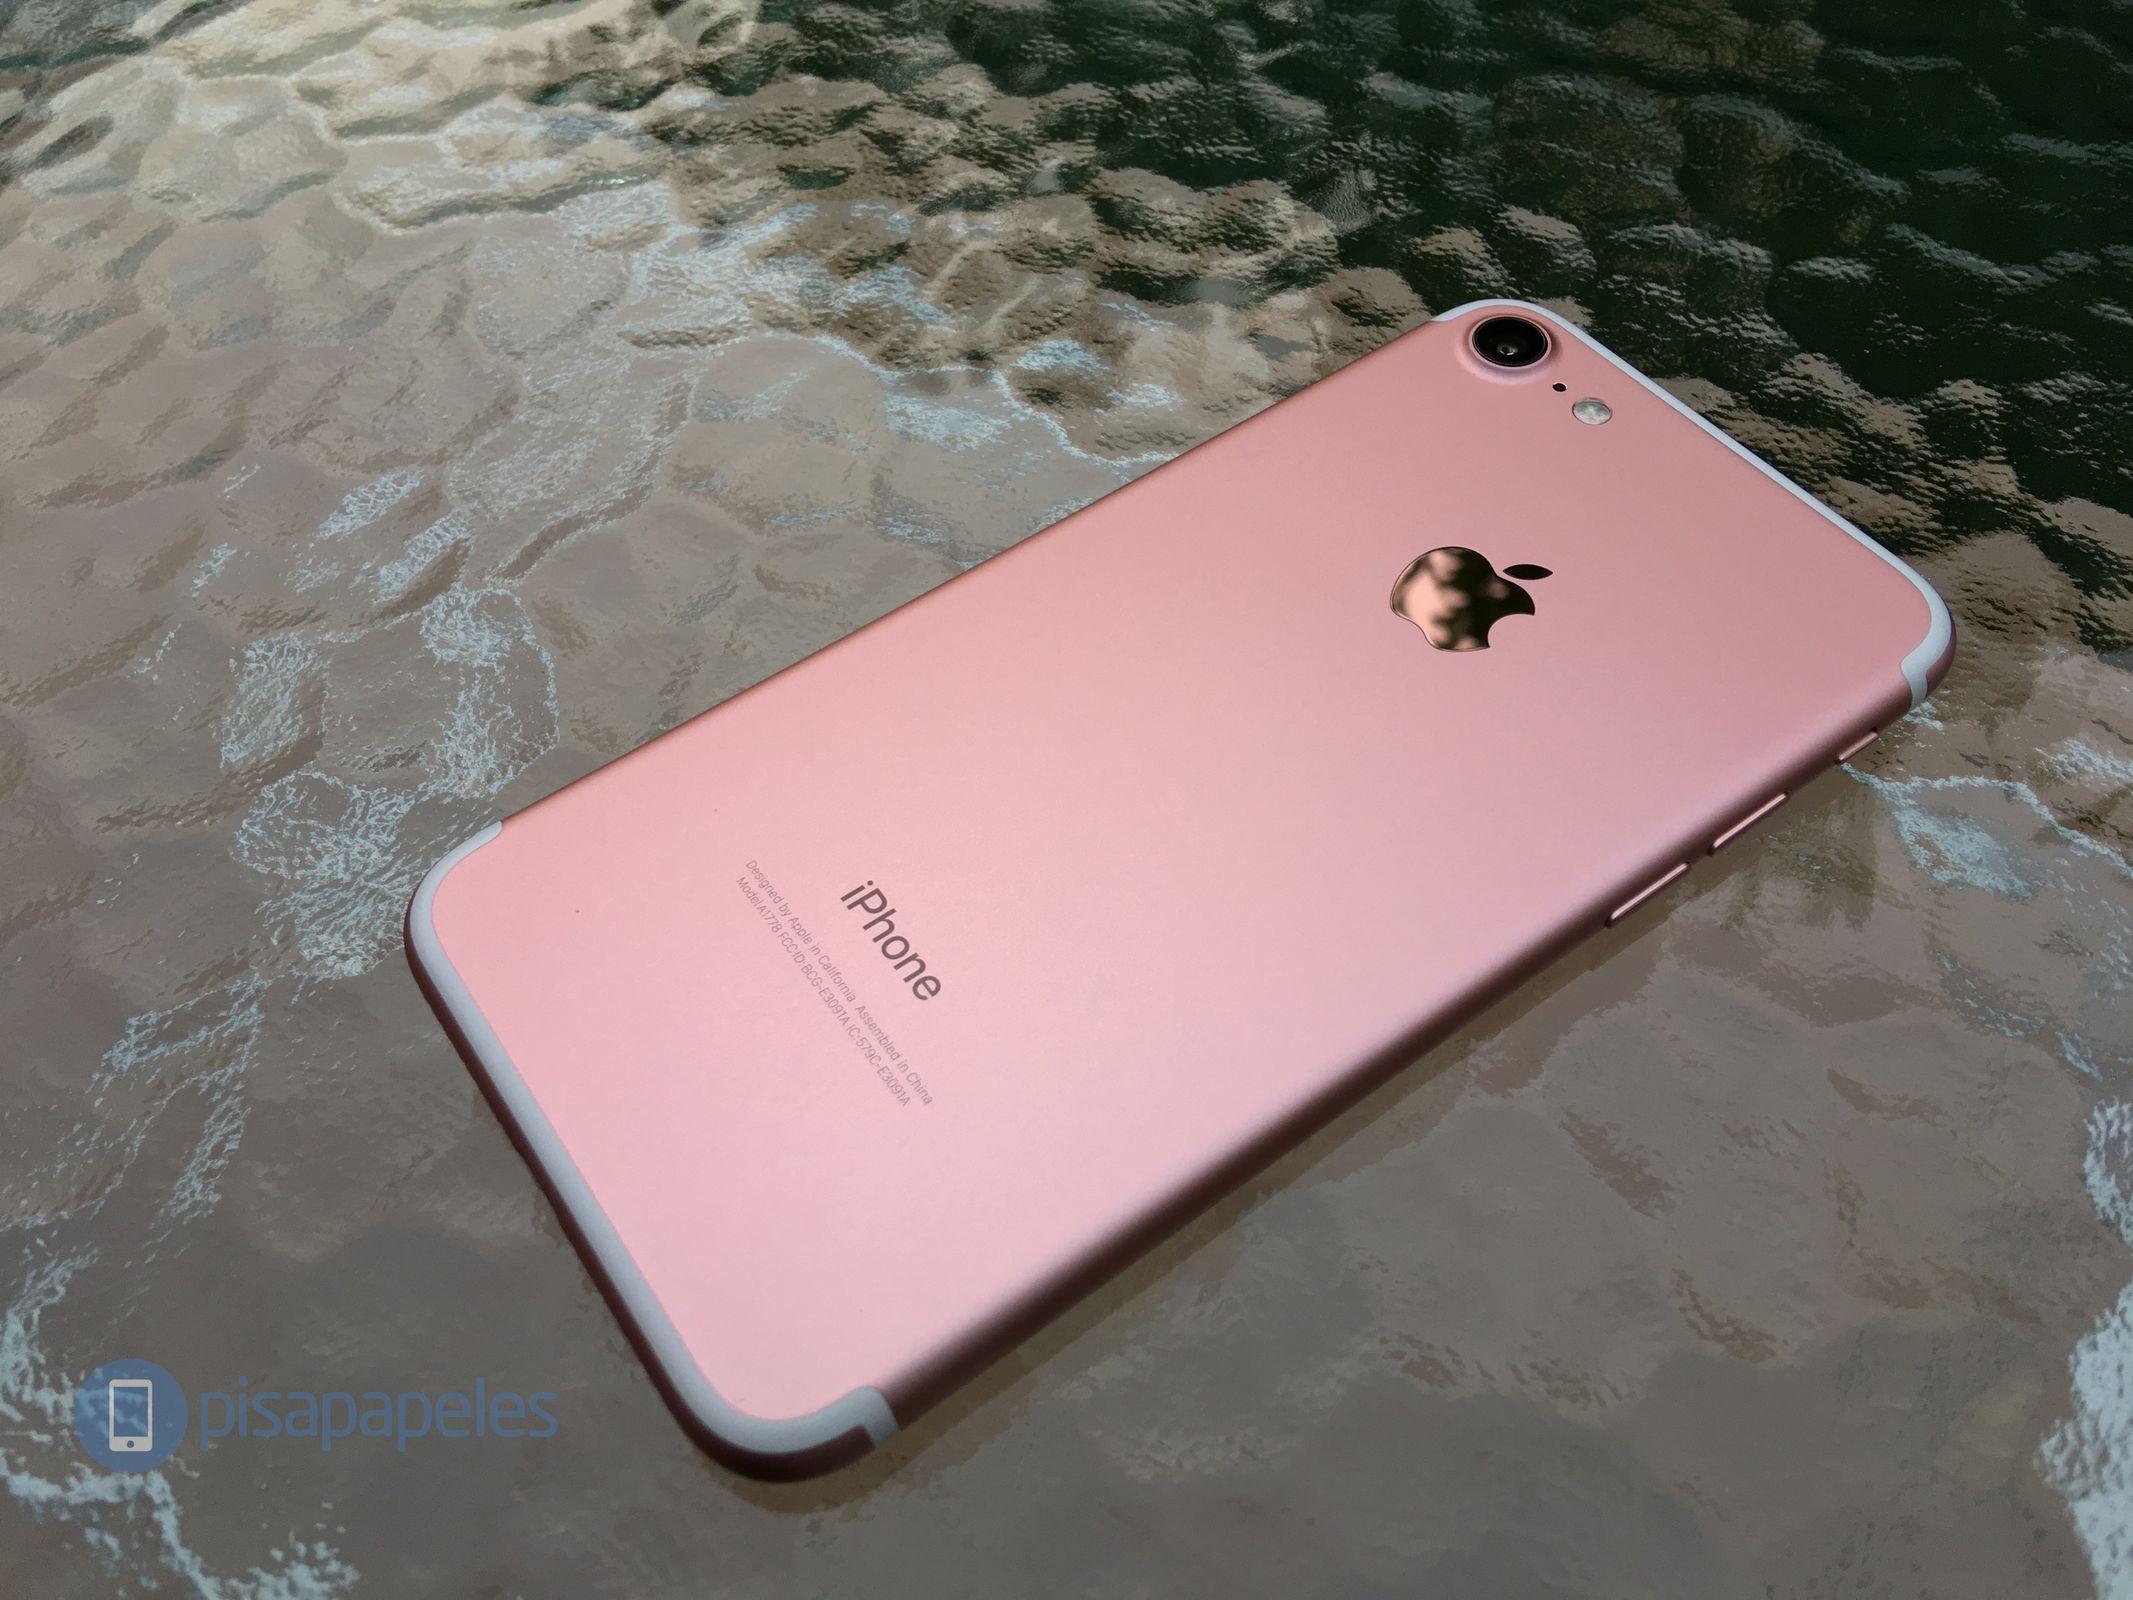 apple-iphone-7-pisapapeles-net_11